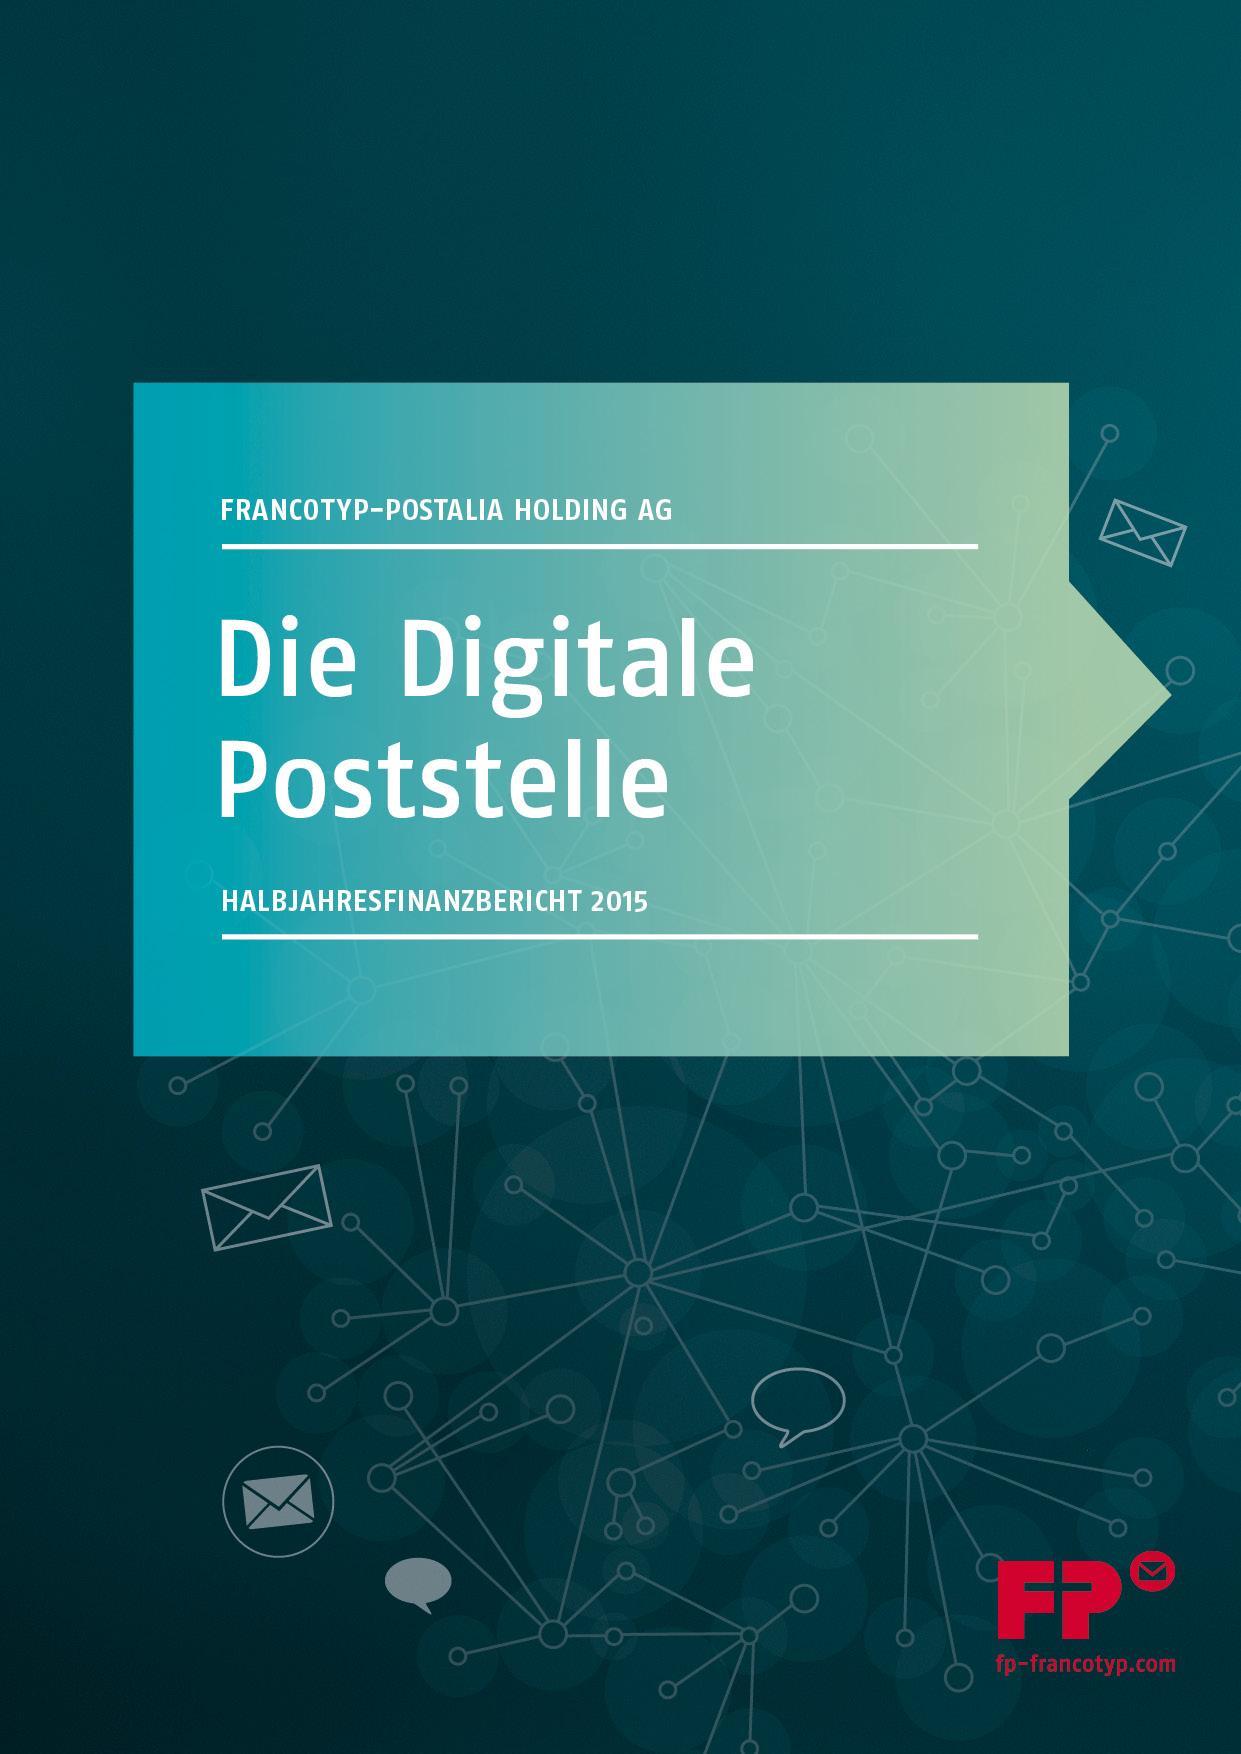 FP_Quartalsbericht_H1_2015_Bild.jpg